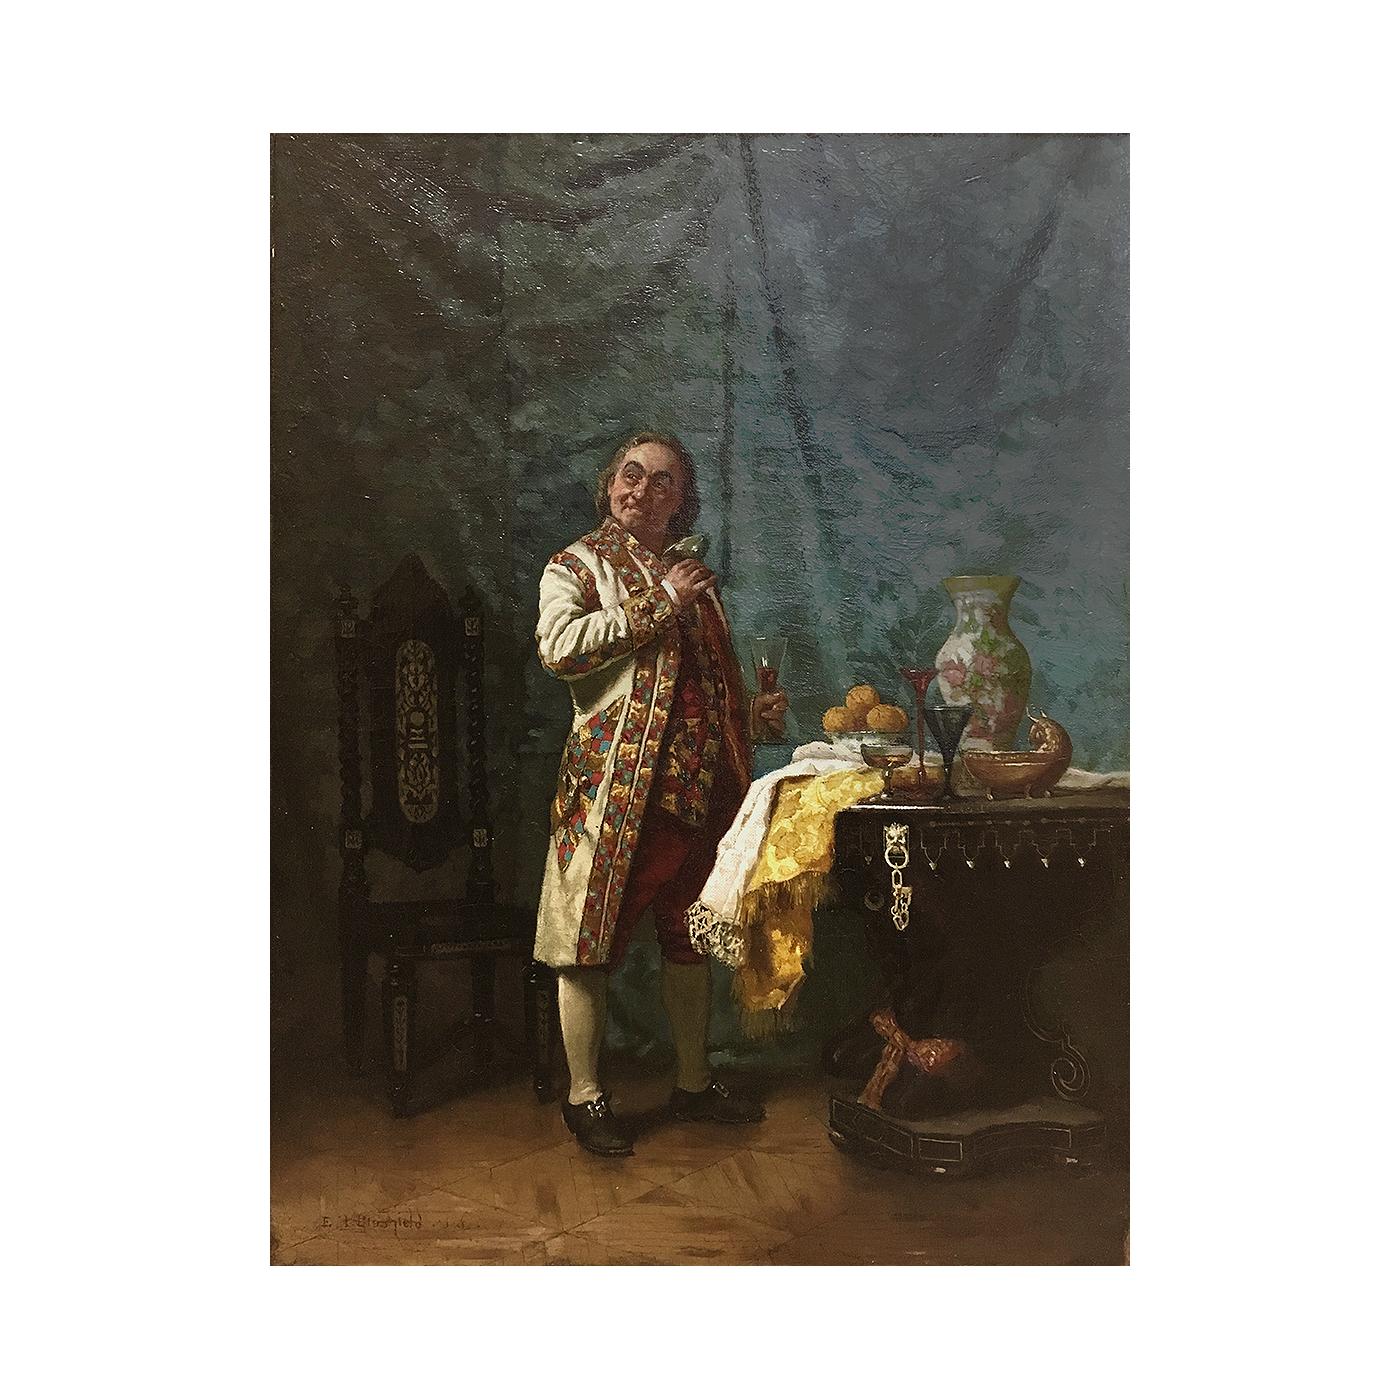 "Edwin Blashfield [1848-1936] American artist ""Draining the glasses"", 1884"